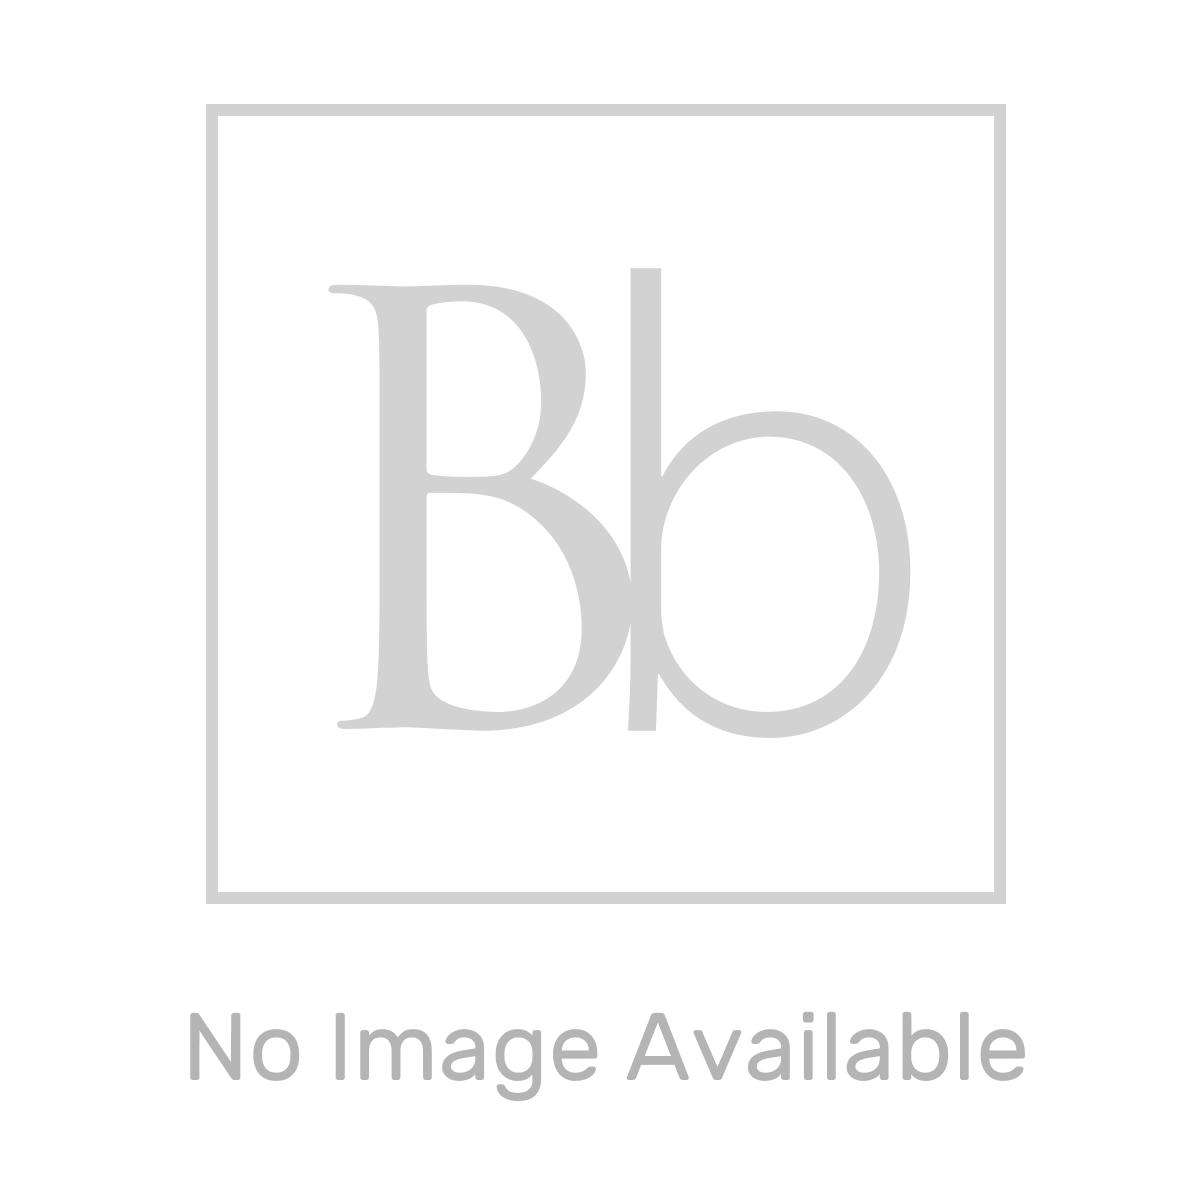 Premier Zaria Thermostatic Mixer Shower